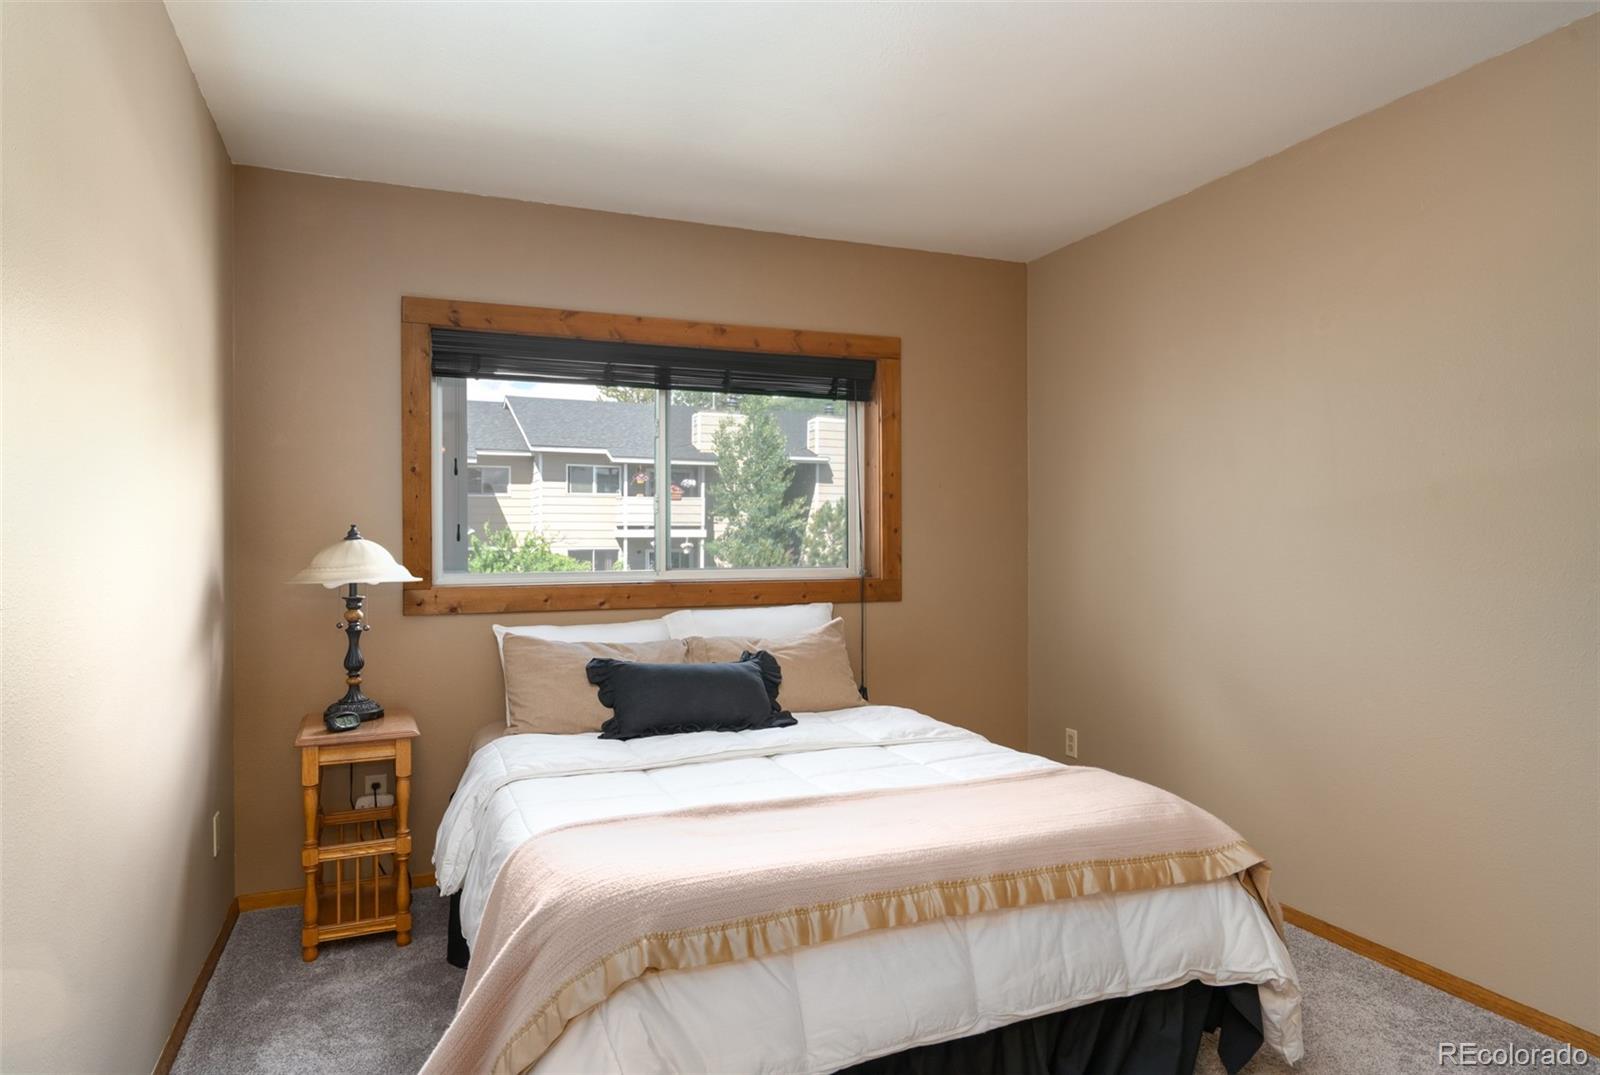 MLS# 5816259 - 10 - 1385 Sparta Plaza #7, Steamboat Springs, CO 80487